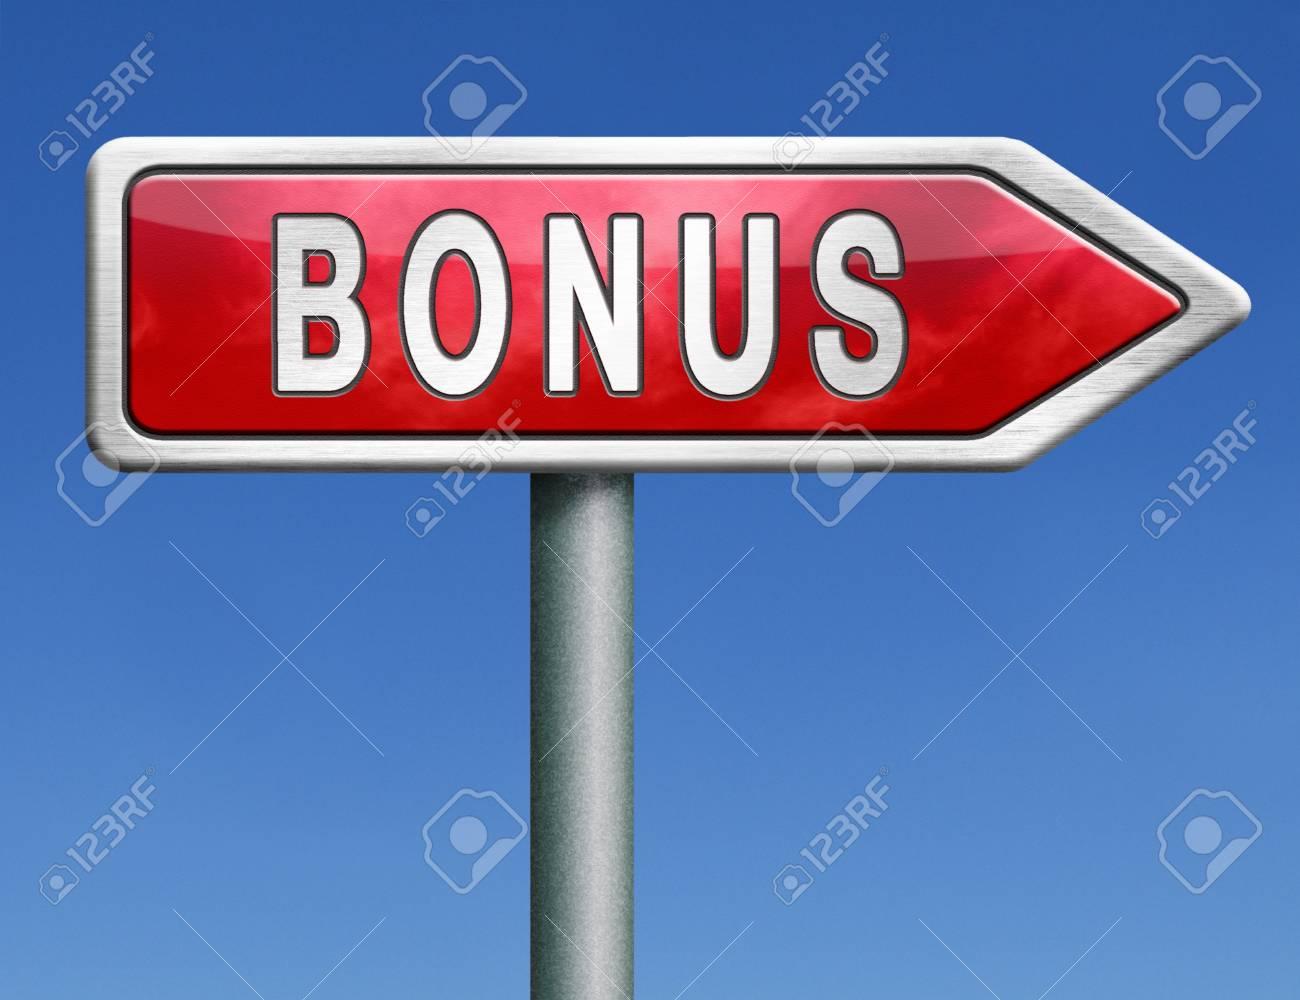 bonus free offer online bargain gratis download icon or button Stock Photo - 20125576